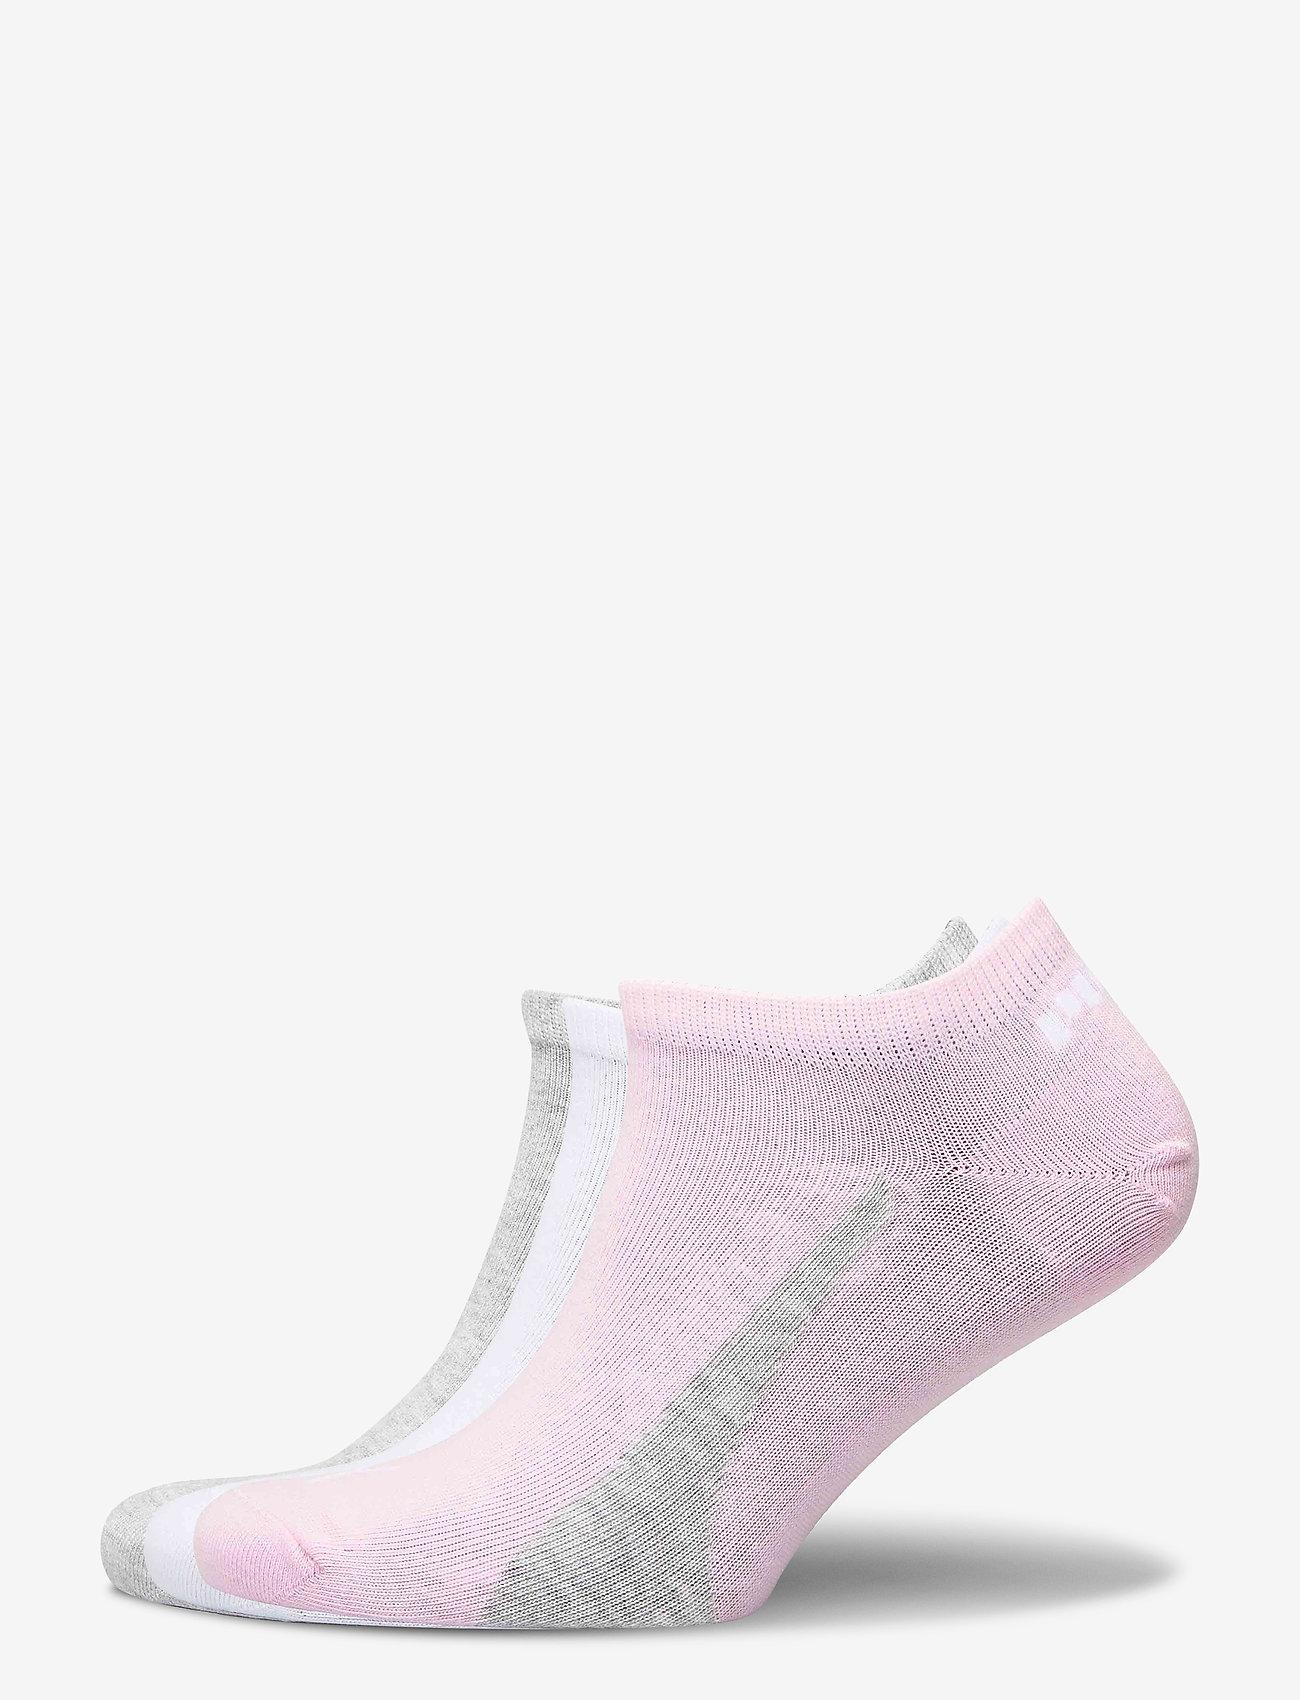 PUMA - PUMA UNISEX LIFESTYLE SNEAKERS 3P - ankelstrumpor - basic pink - 0